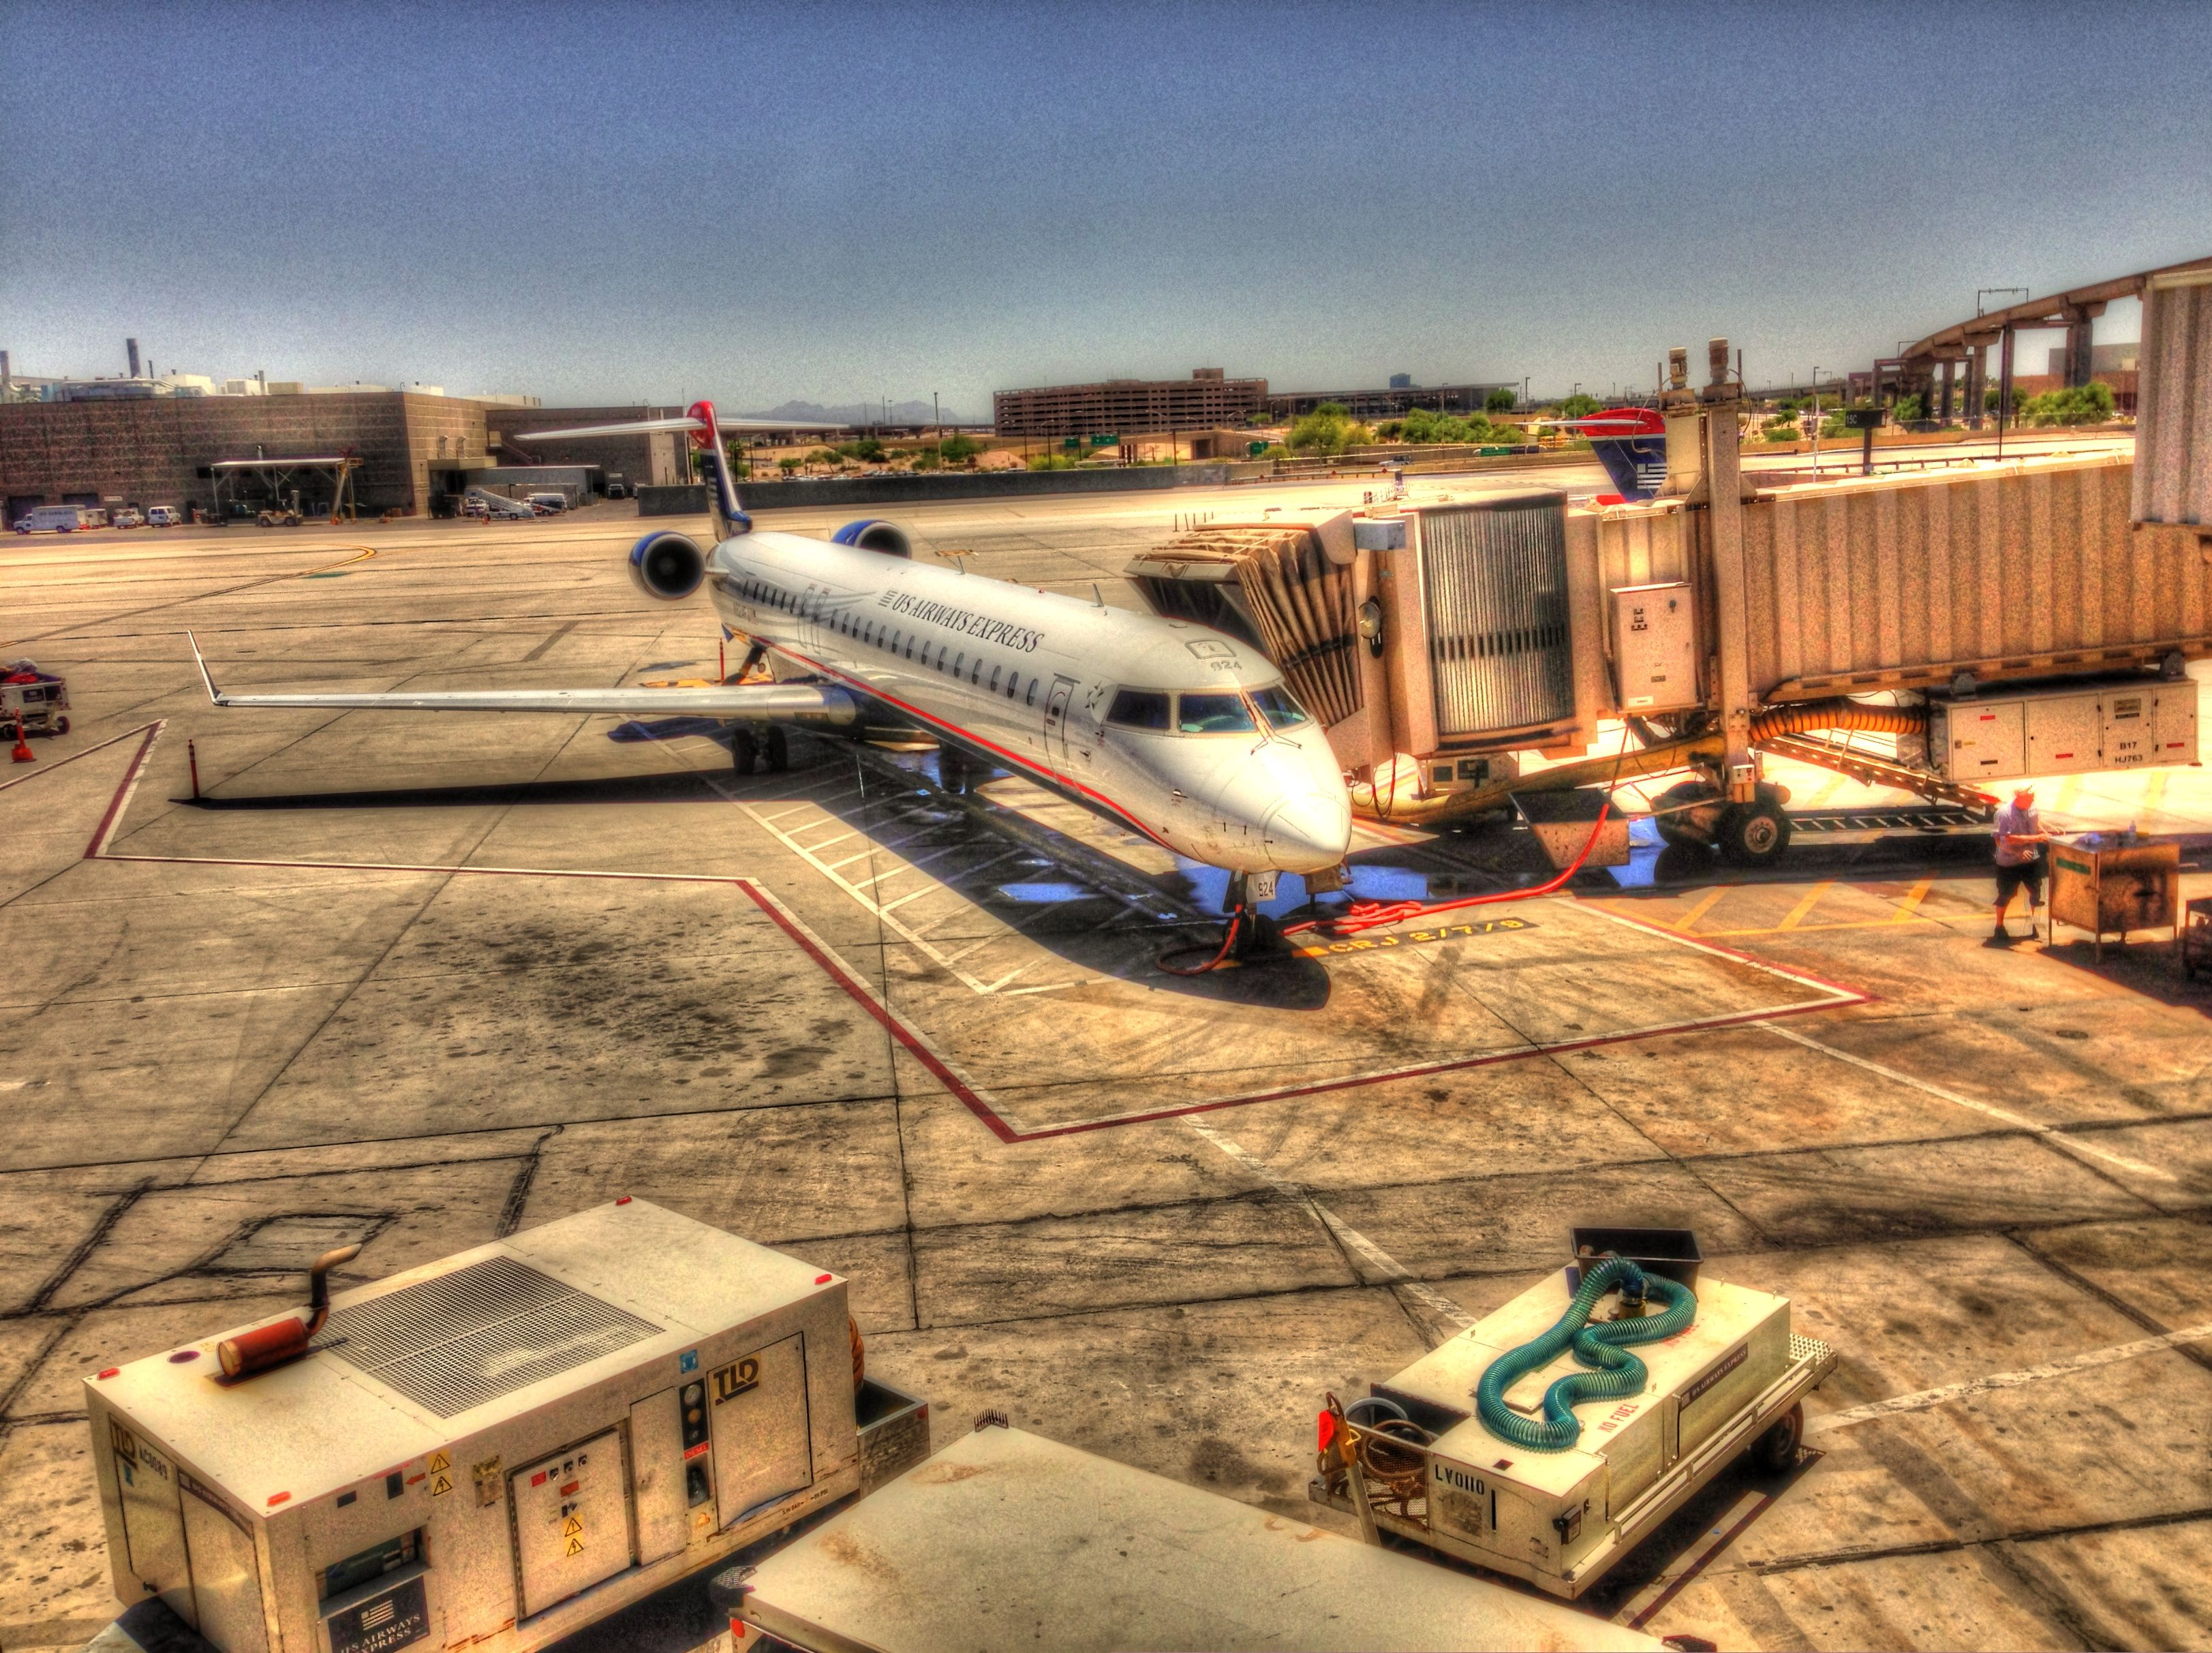 U.S. Airways Canadair CRJ at Phoenix Sky Harbor International Airport.